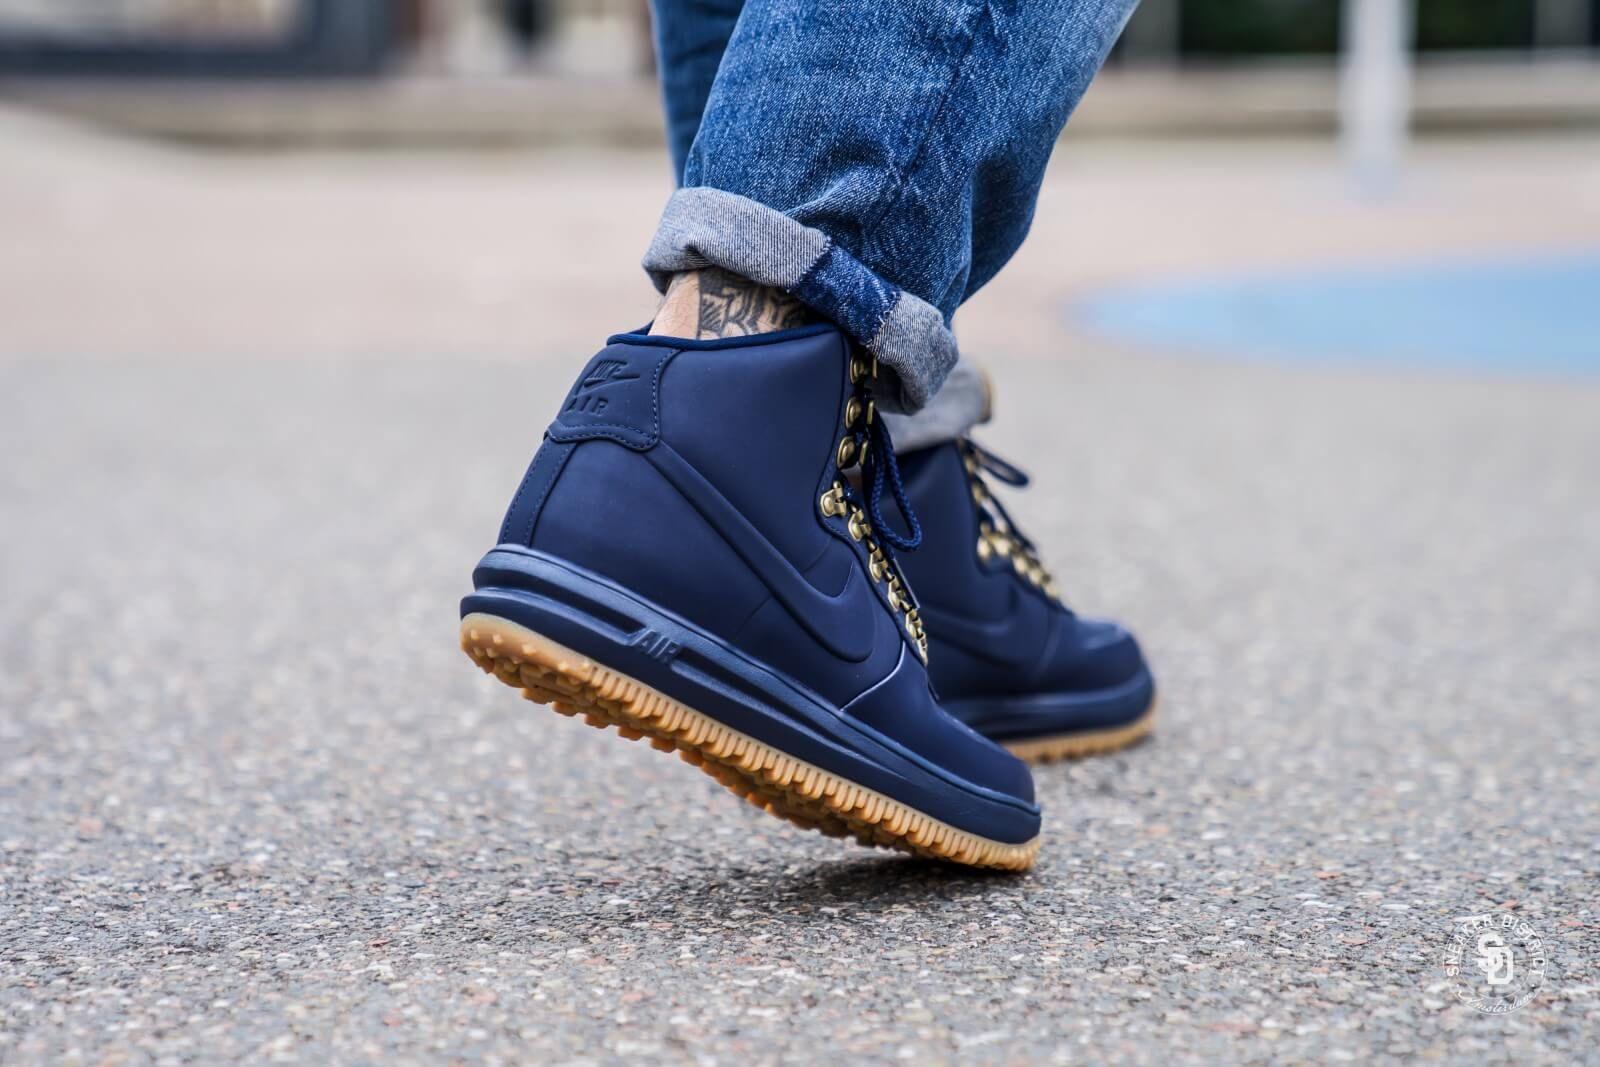 Pin on shoe game